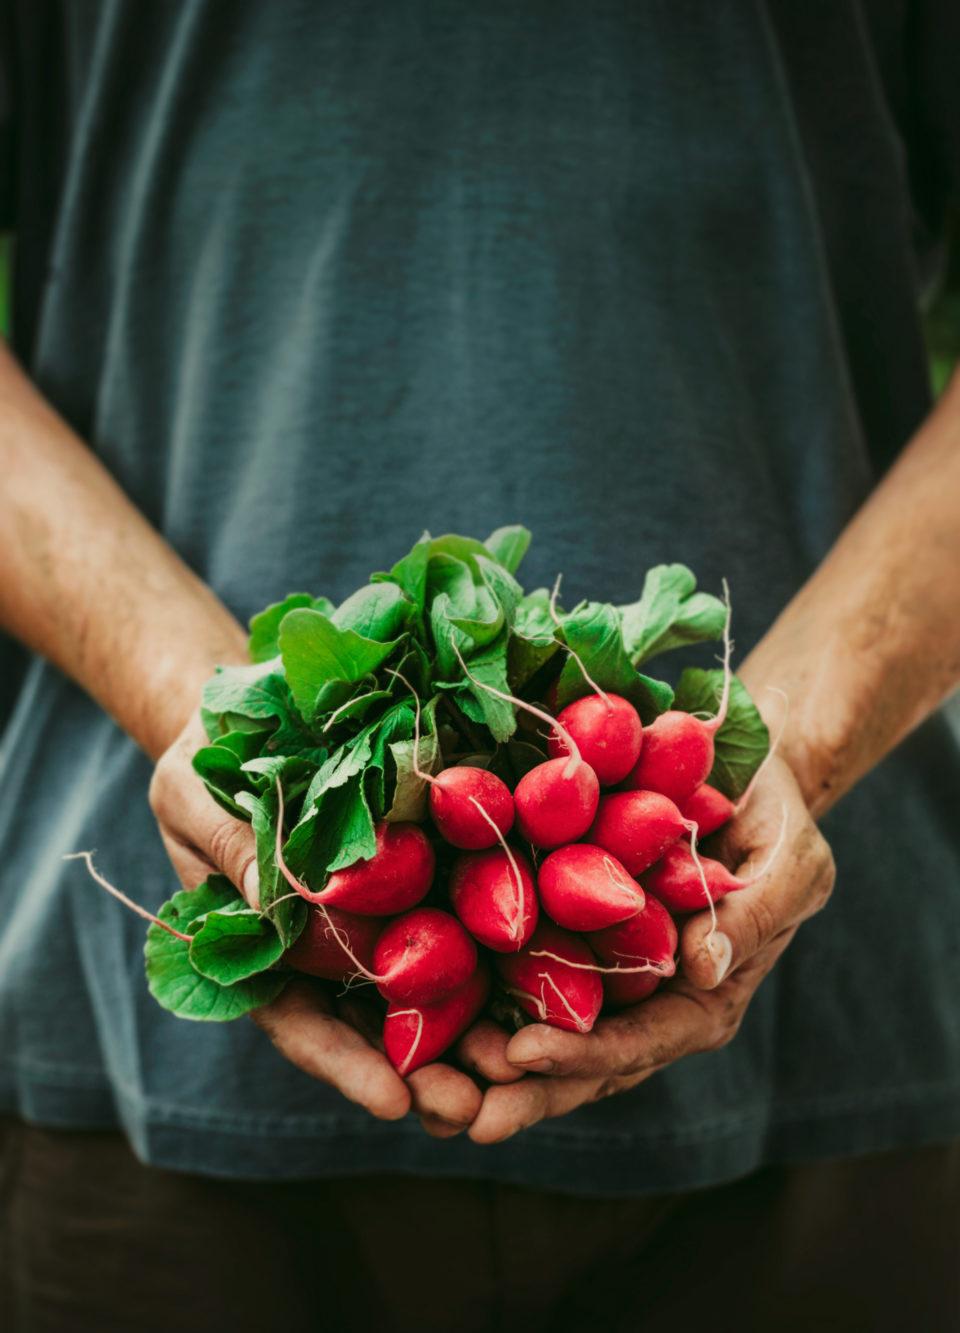 Farmers hands holding freshly harvested radishes